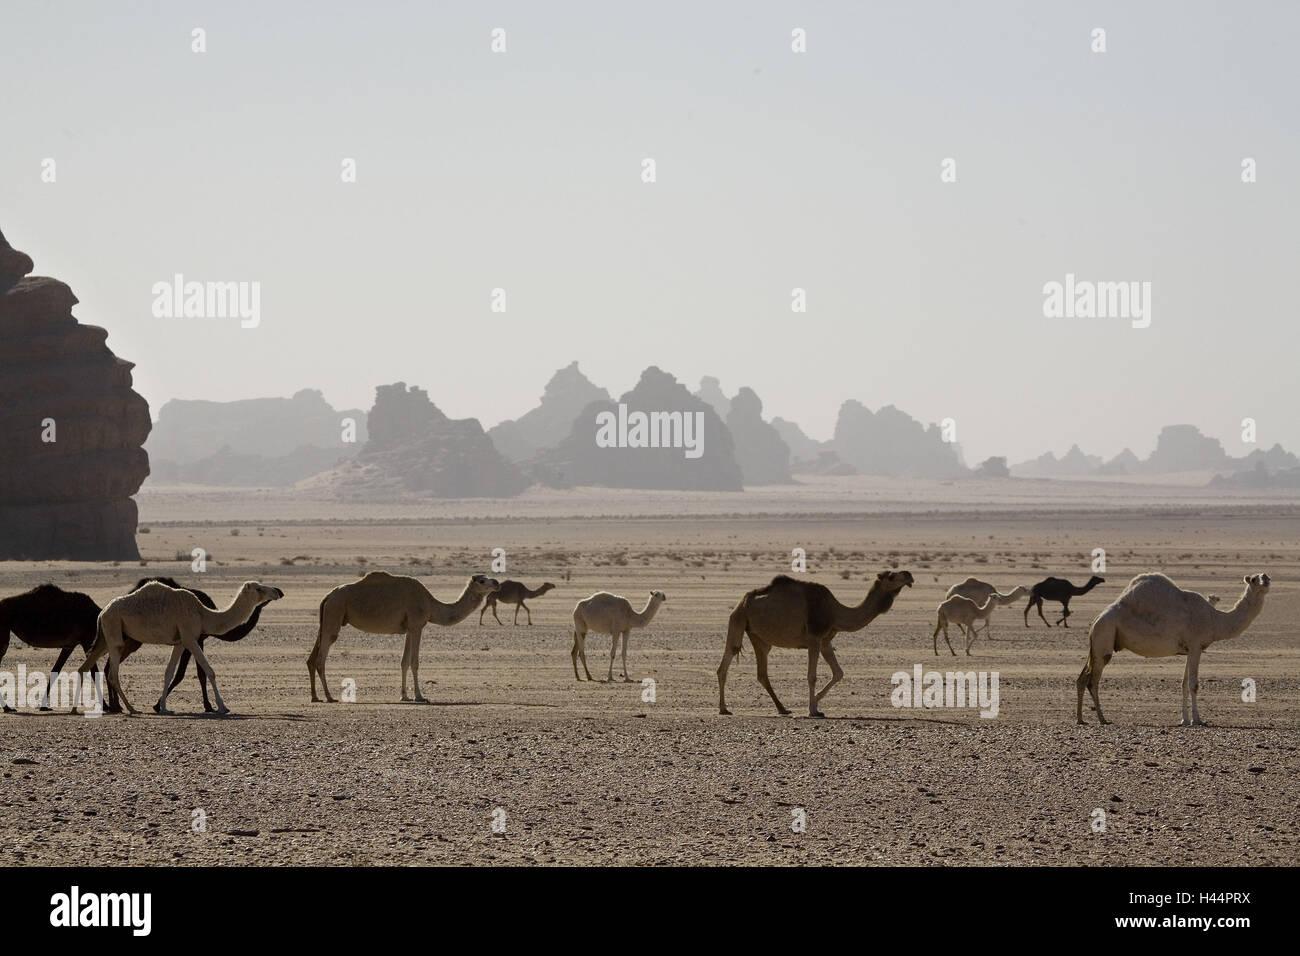 Arabia Saudita, provincia de Tabuk, Hisma-mundo de montaña, desierto, camellos, Imagen De Stock